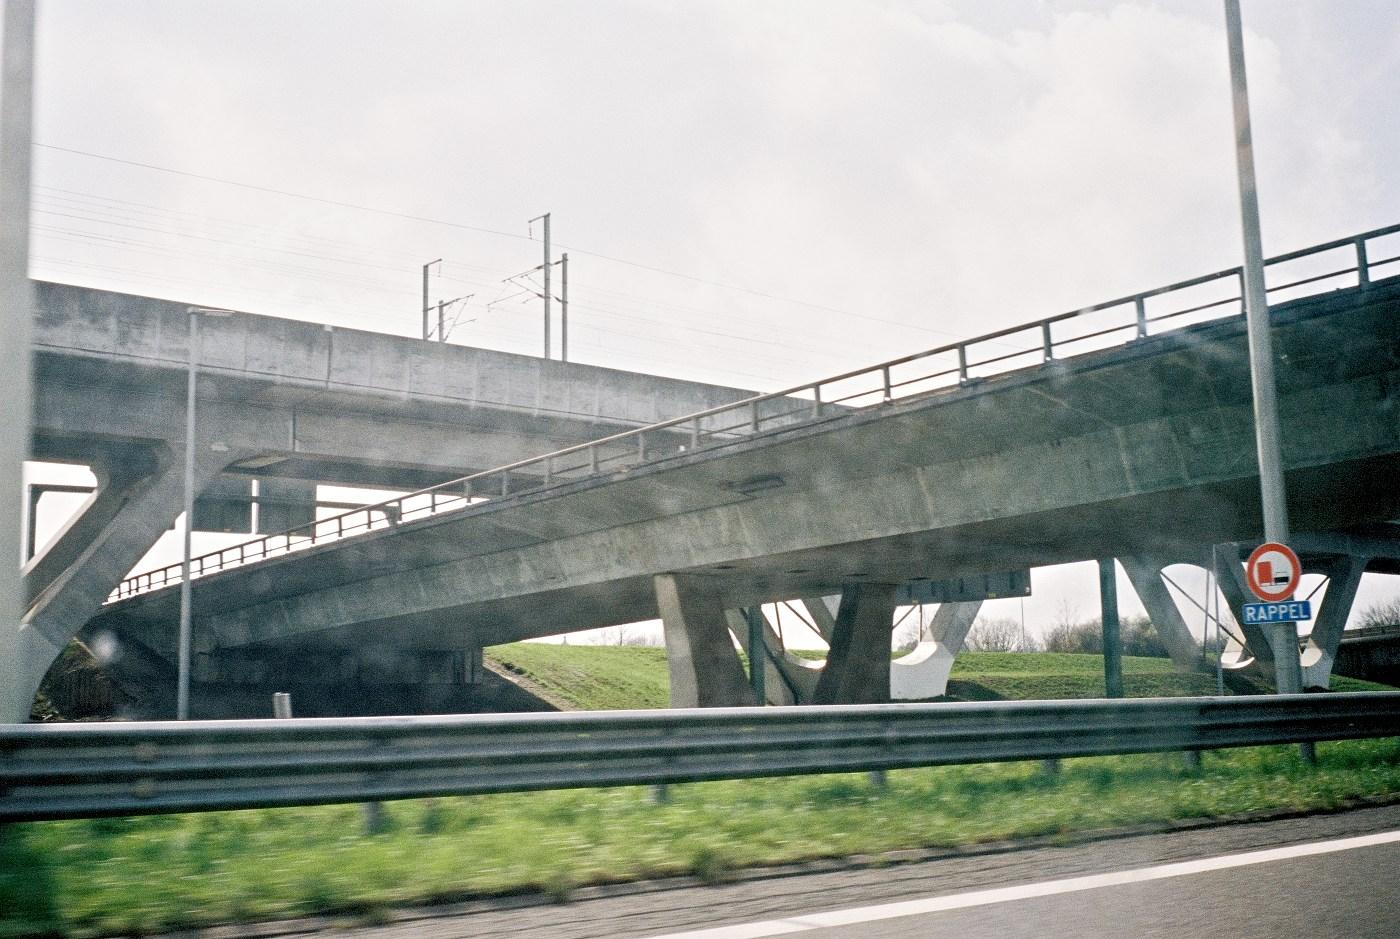 000009JoergBergs-KodakPortra400-MeinFilmLab-M7-35 (1)